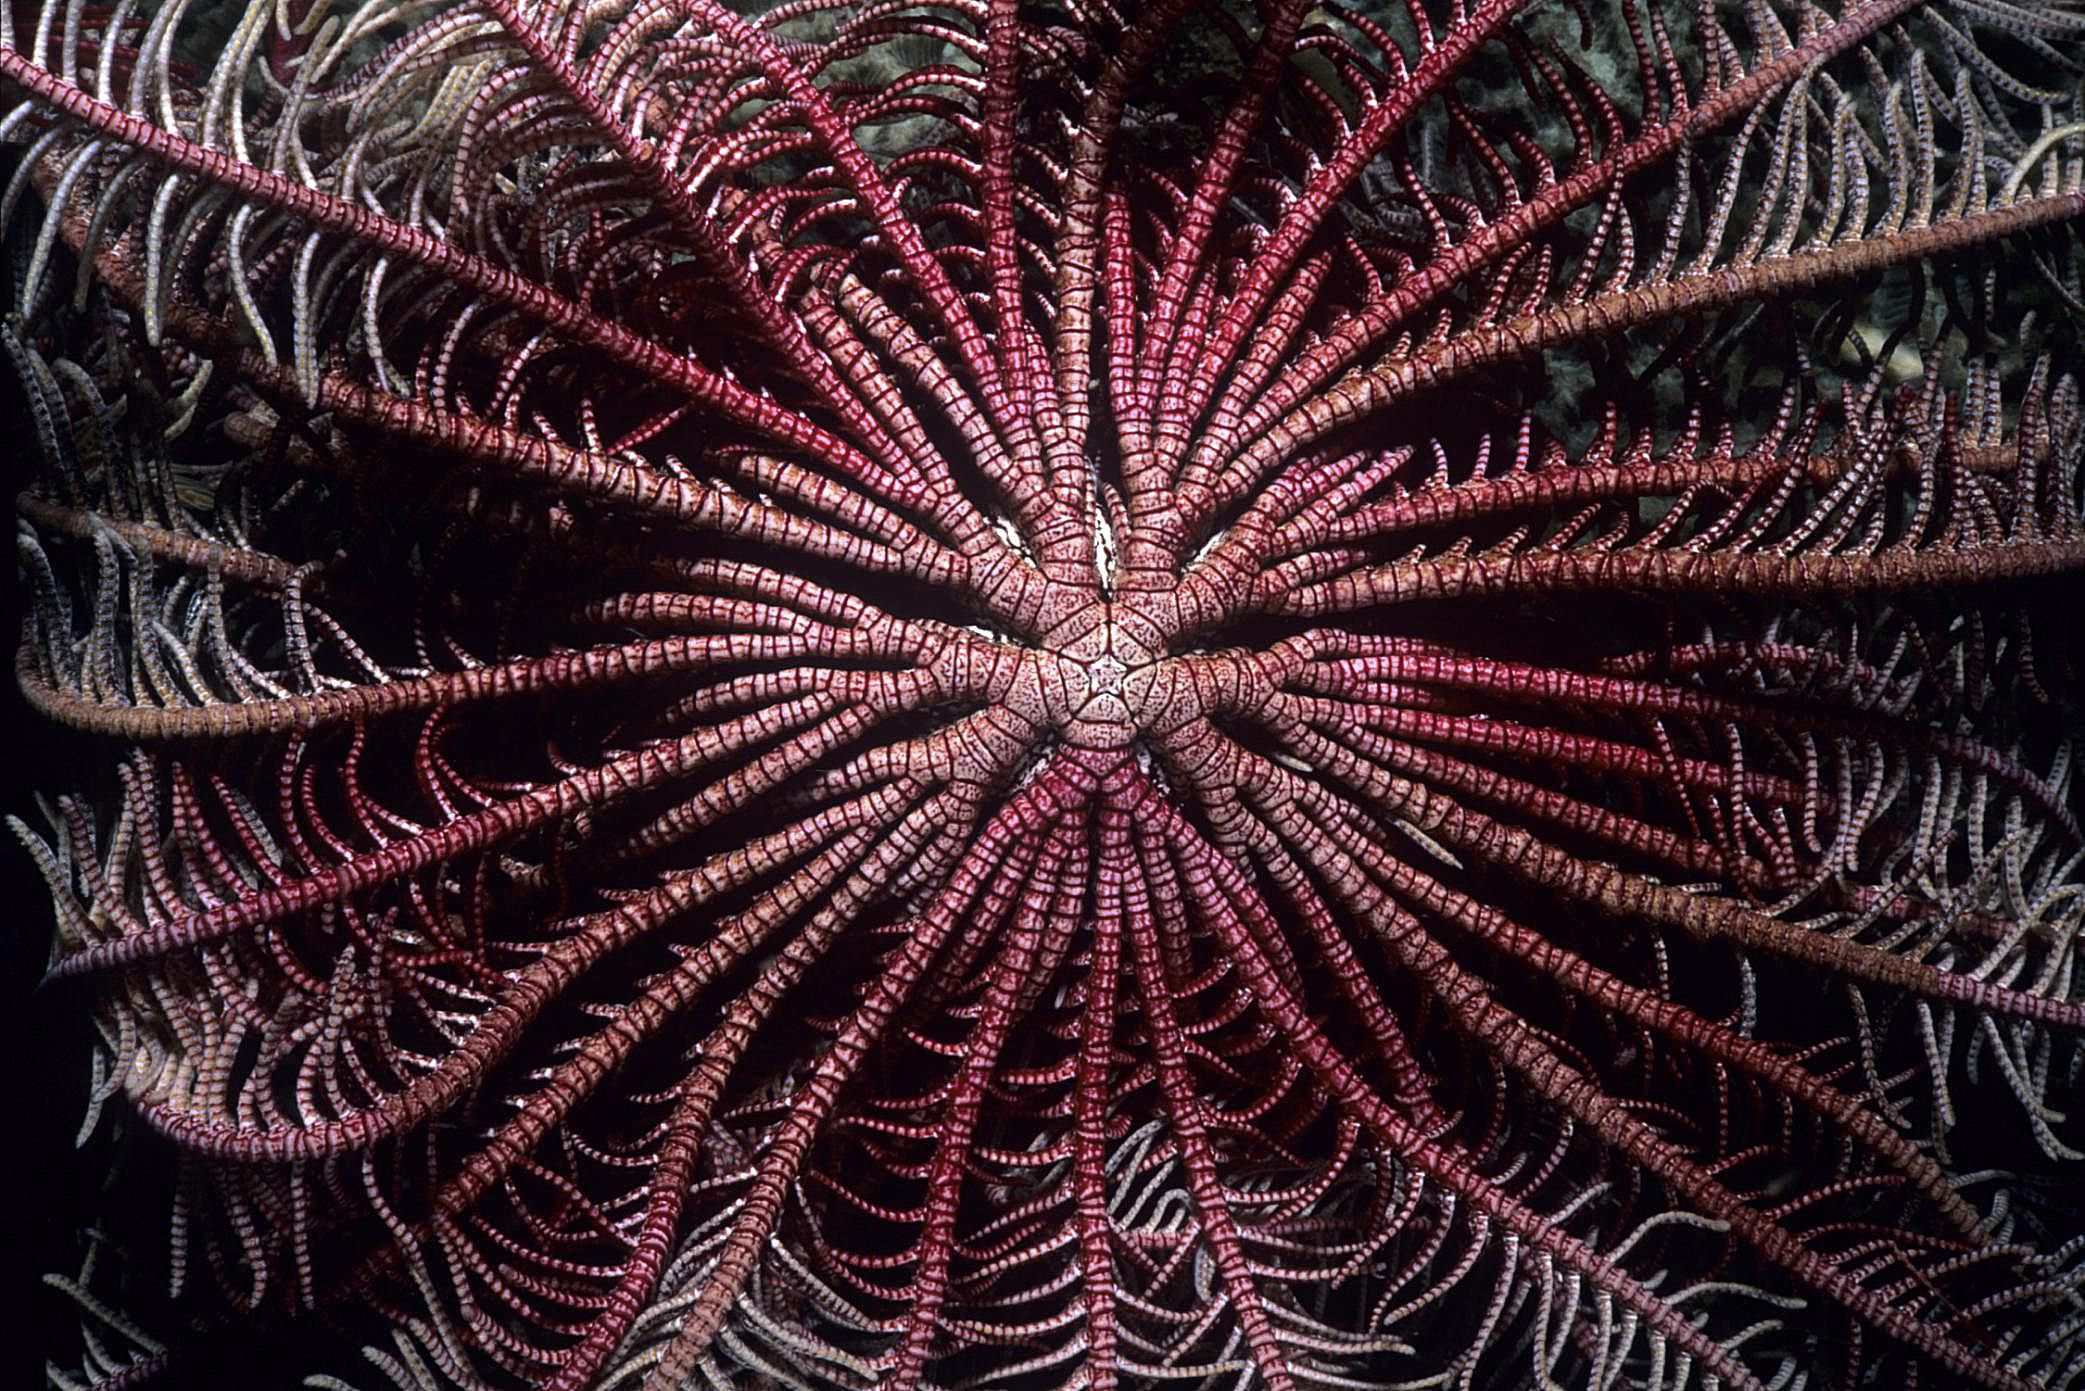 radial symmetry in marine life